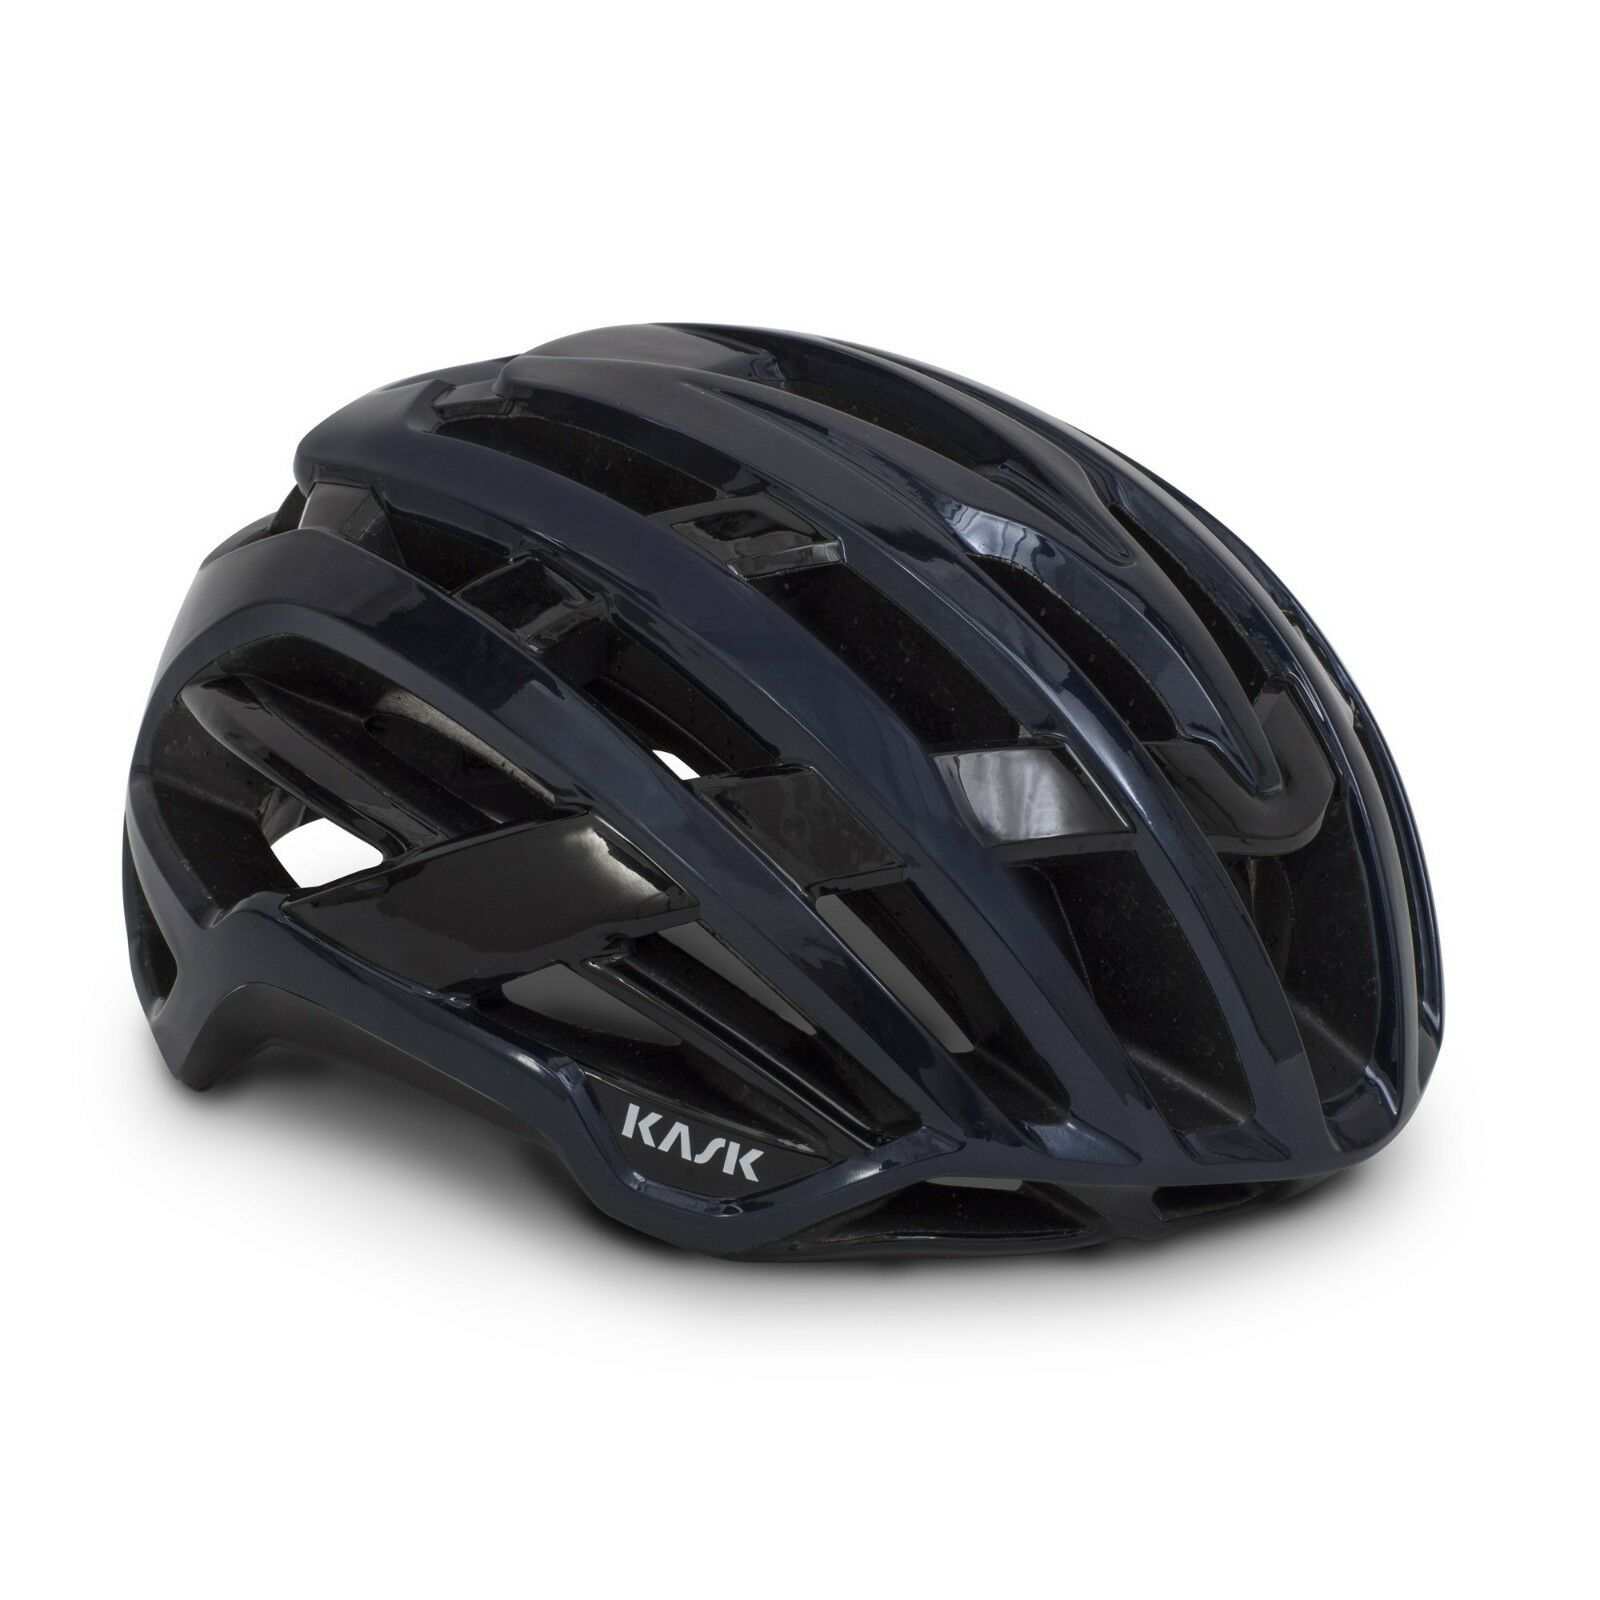 Kask valegro helmet navy blu